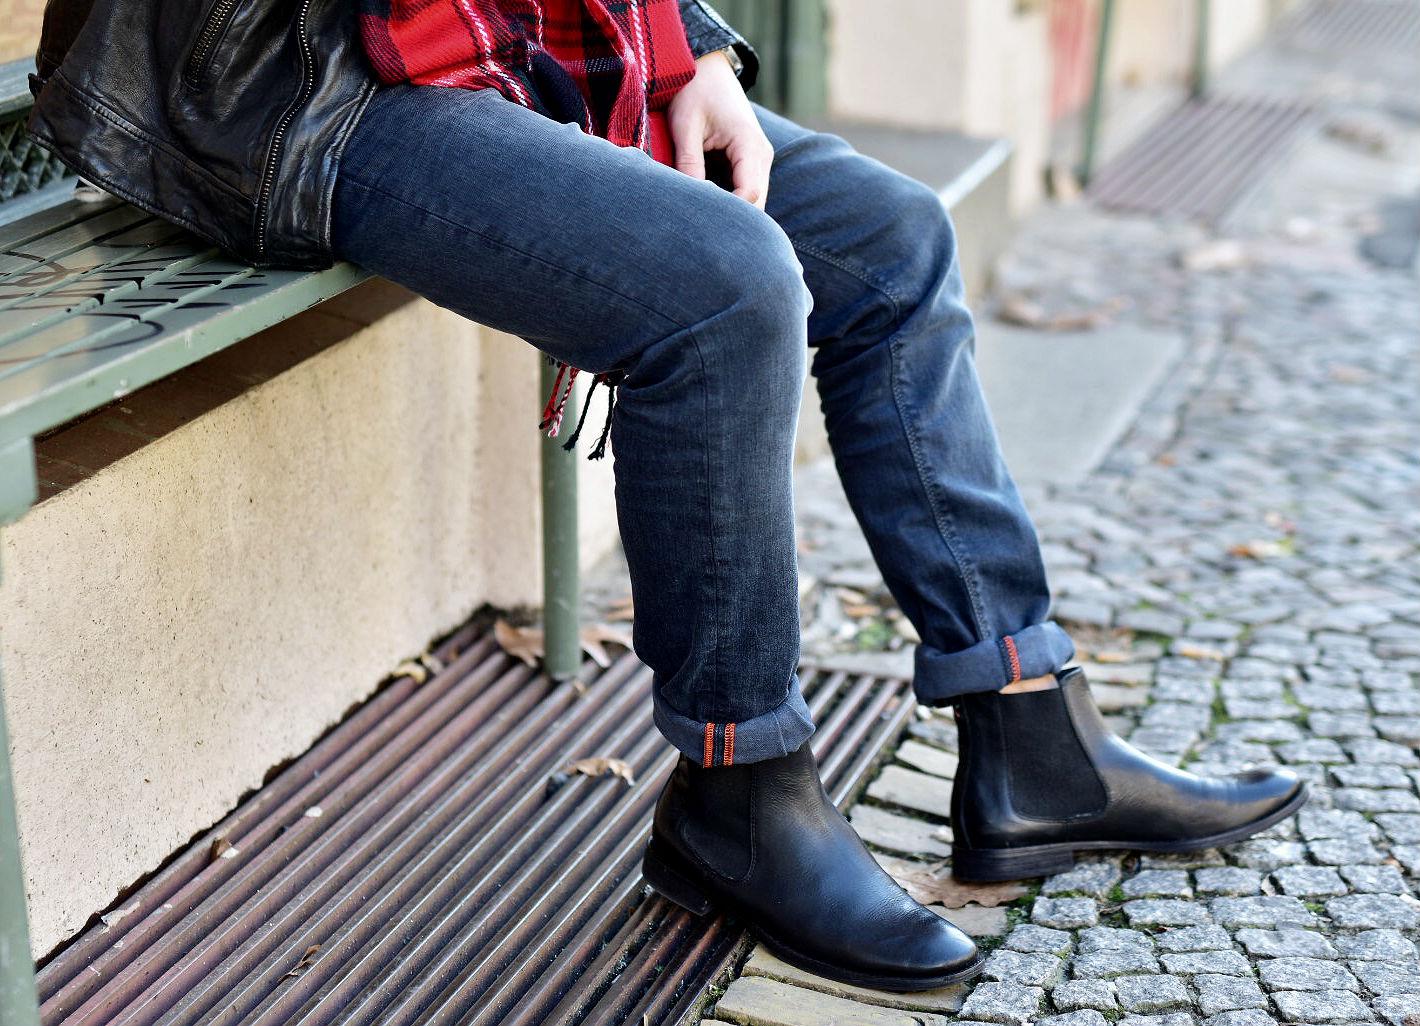 tommeezjerry-styleblog-maennerblog-maenner-modeblog-berlin-berlinblog-maennermodeblog-outfit-lederjacke-alberto-pants-jeans-chelsea-boots-schal-kariert-streetlook